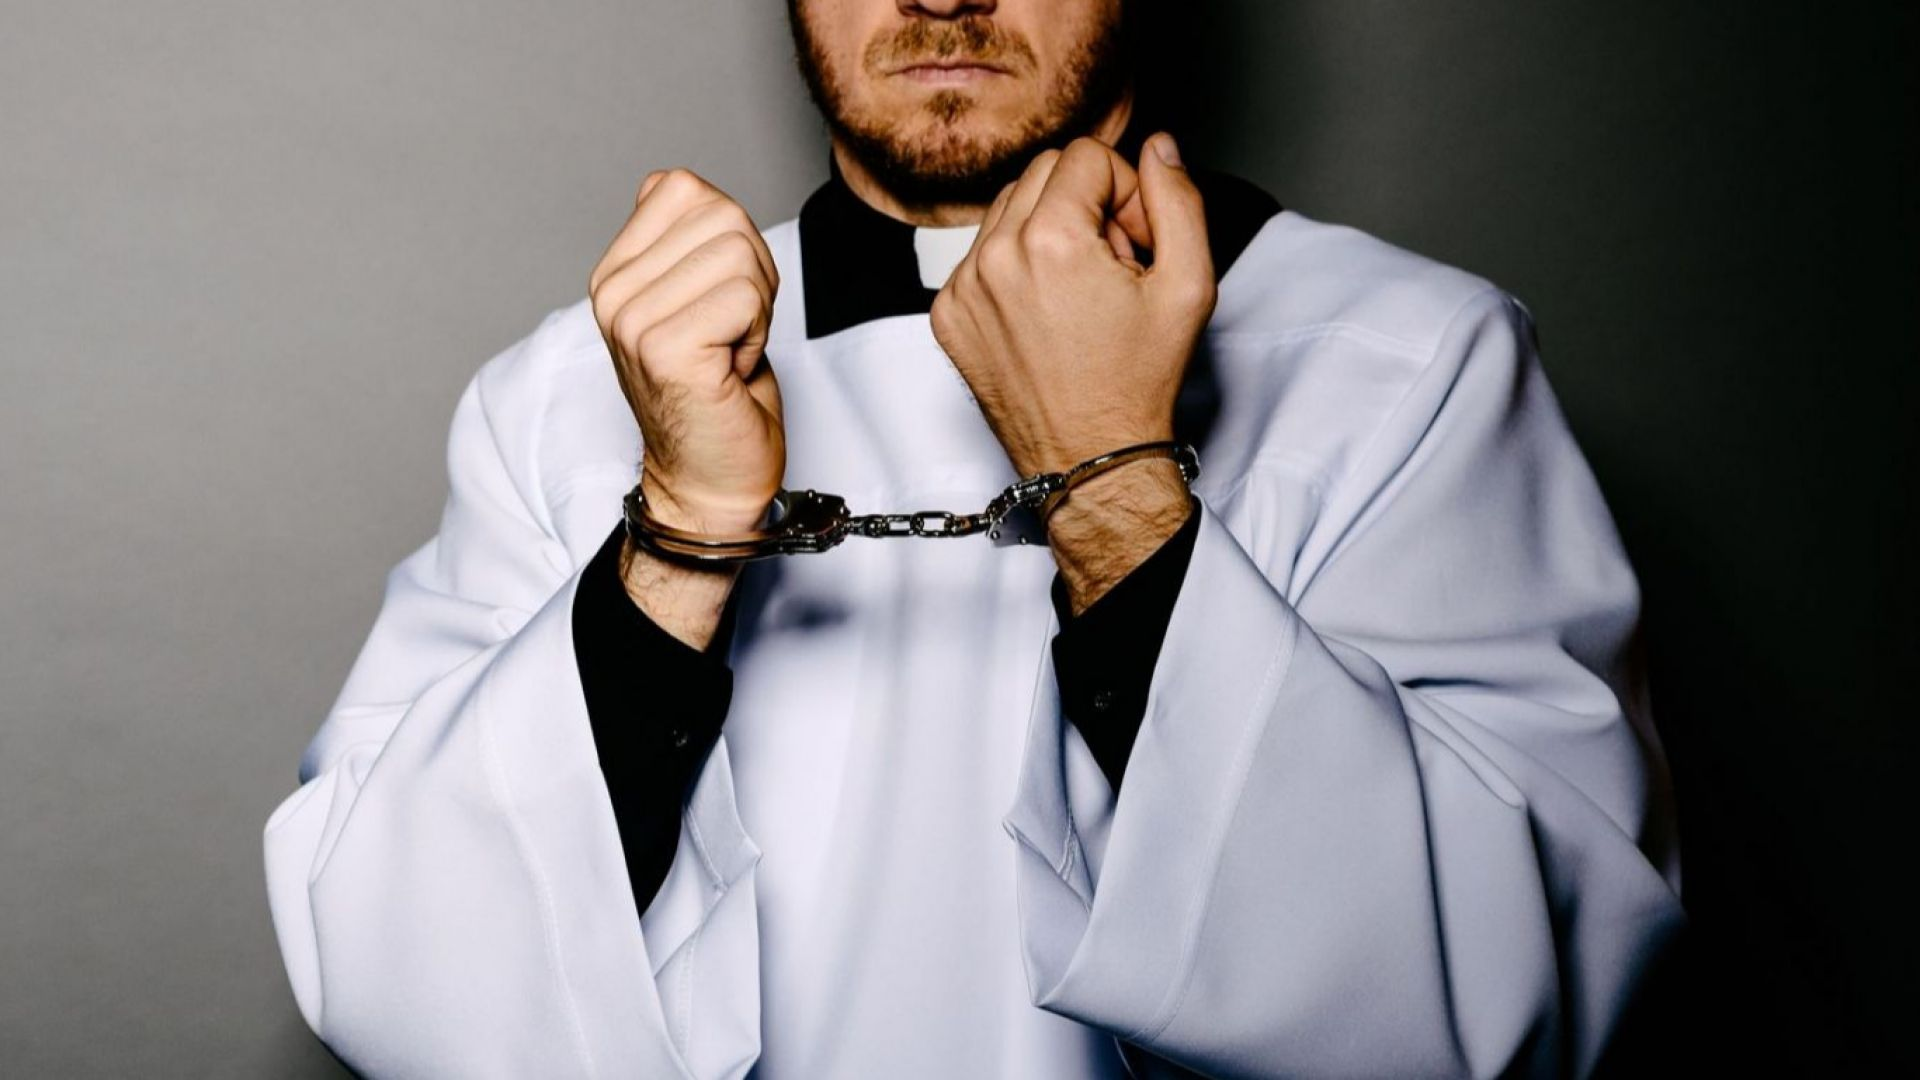 87 г. затвор за двама католически свещеници-педофили